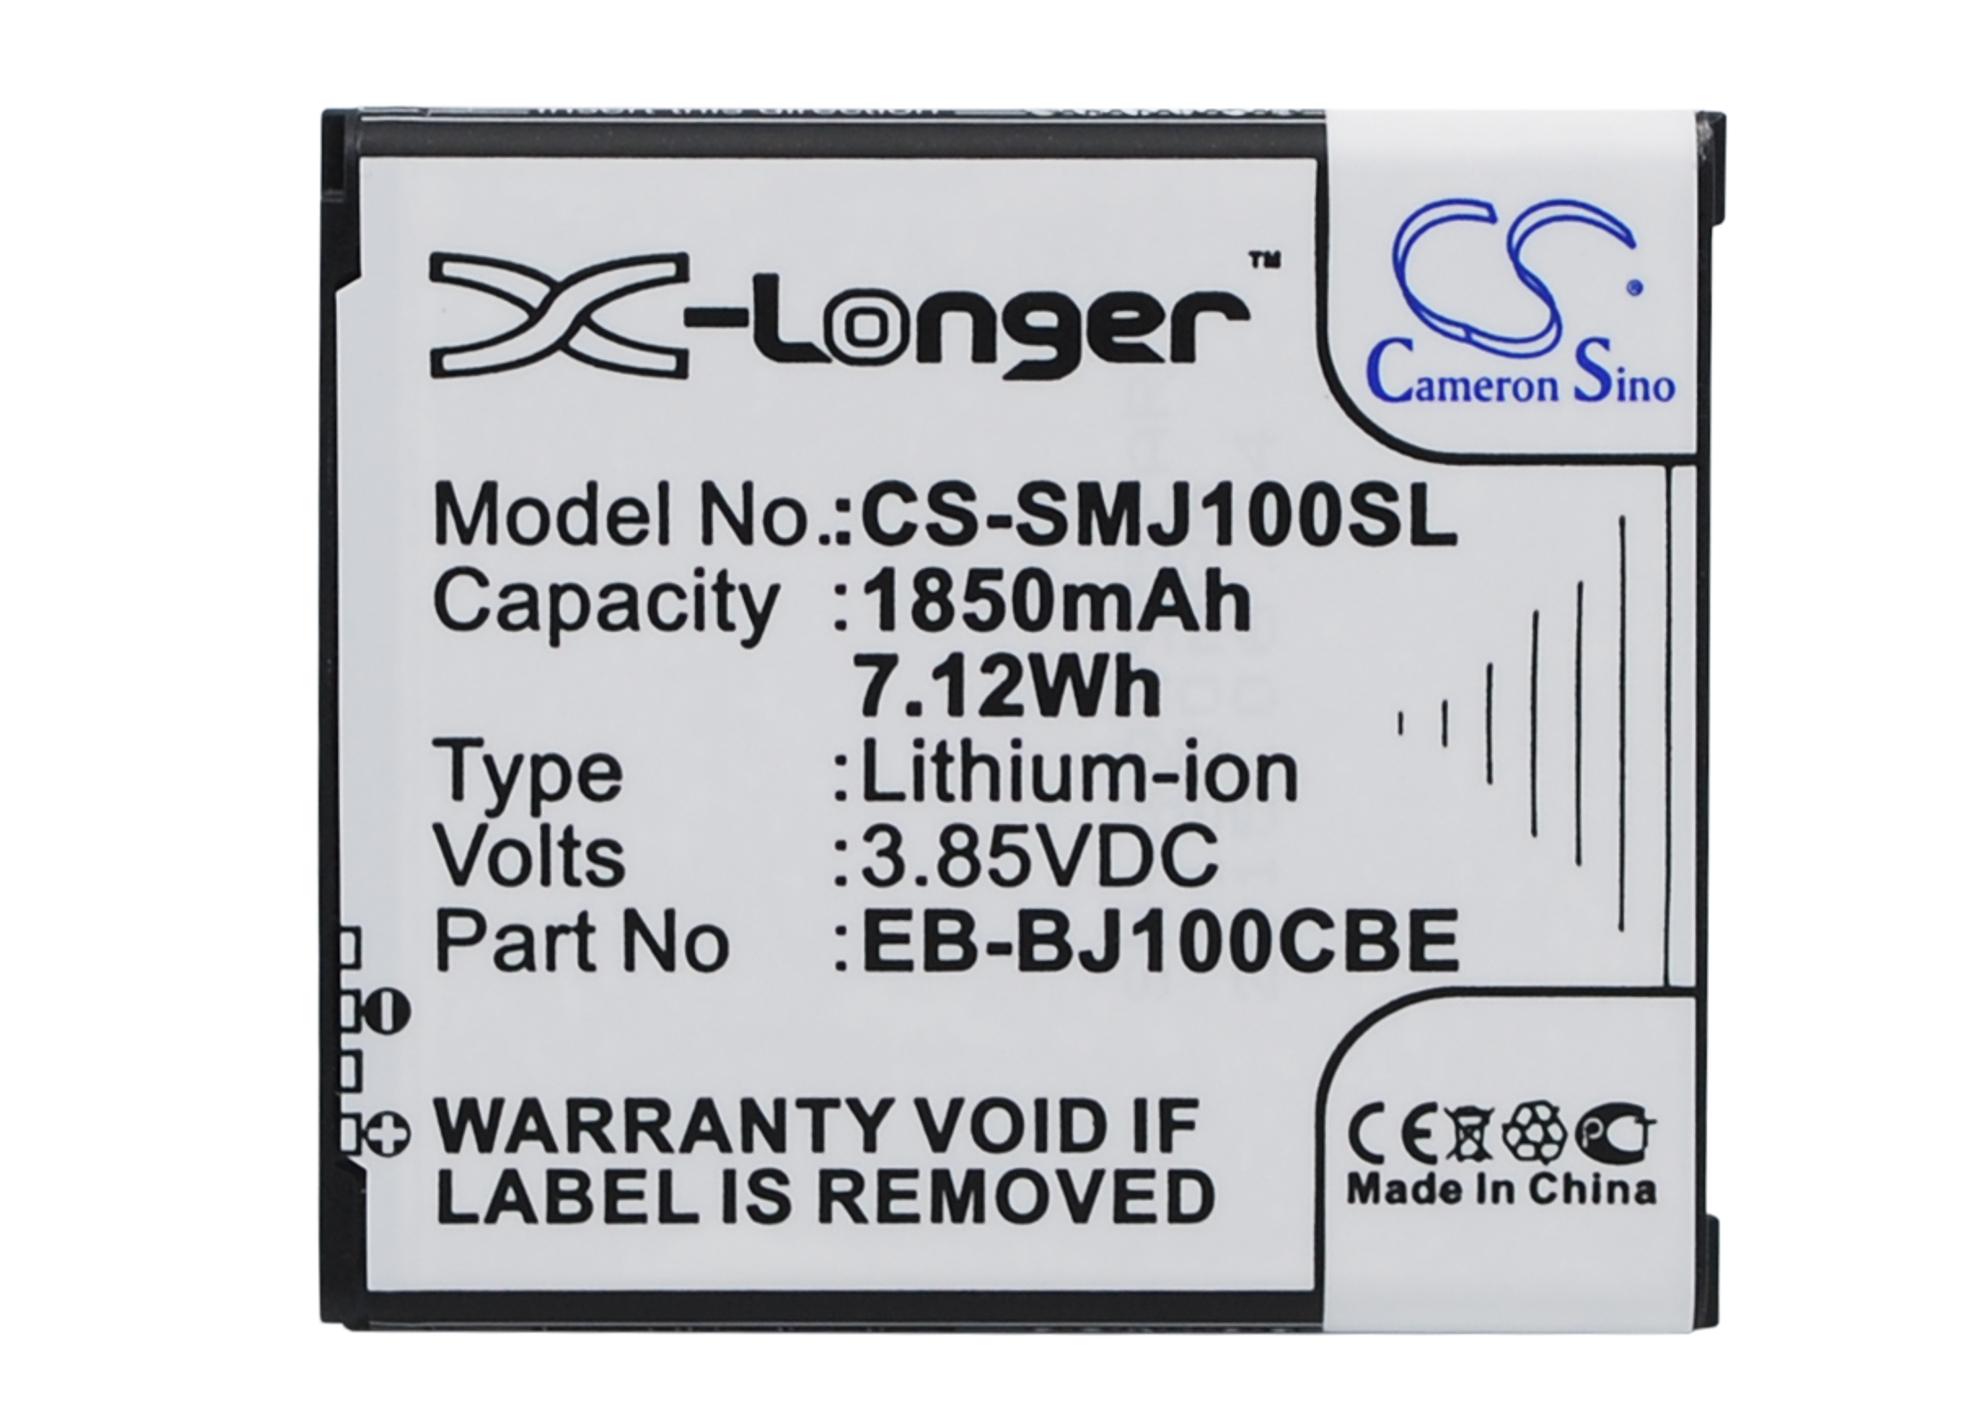 Cameron Sino baterie do mobilů pro SAMSUNG SM-J100H/DD 3.85V Li-ion 1850mAh černá - neoriginální